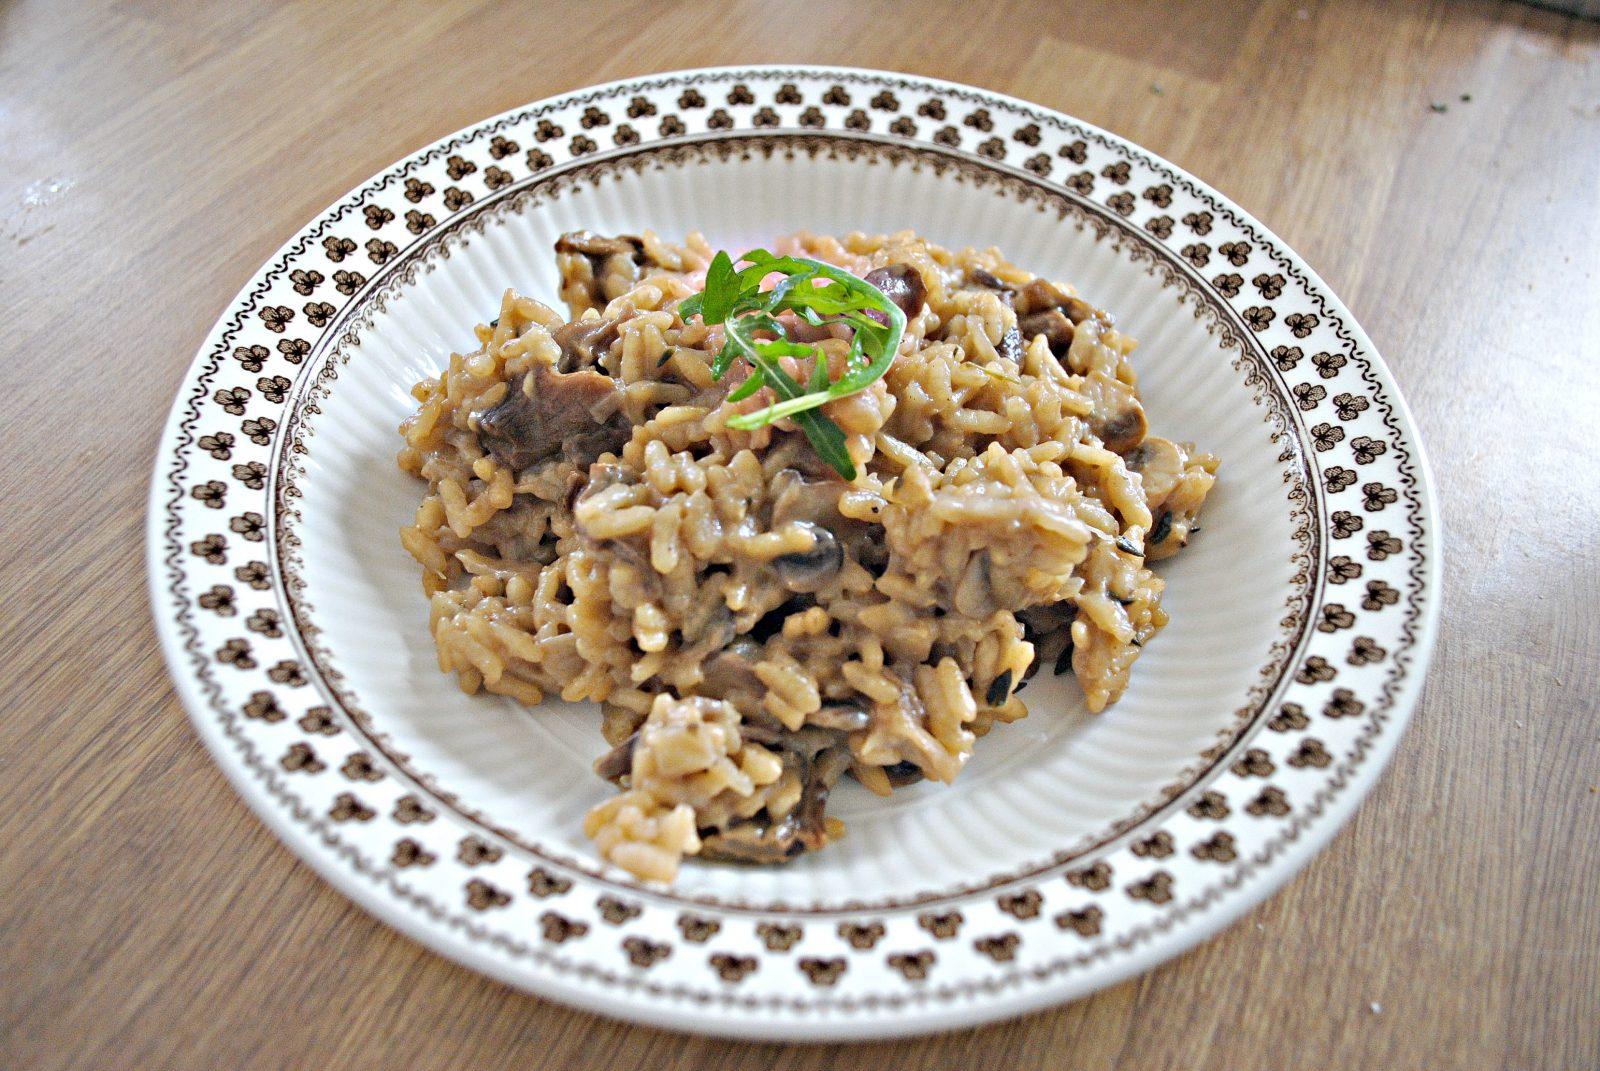 Wonderful Wild Mushroom & Truffle Oil Risotto